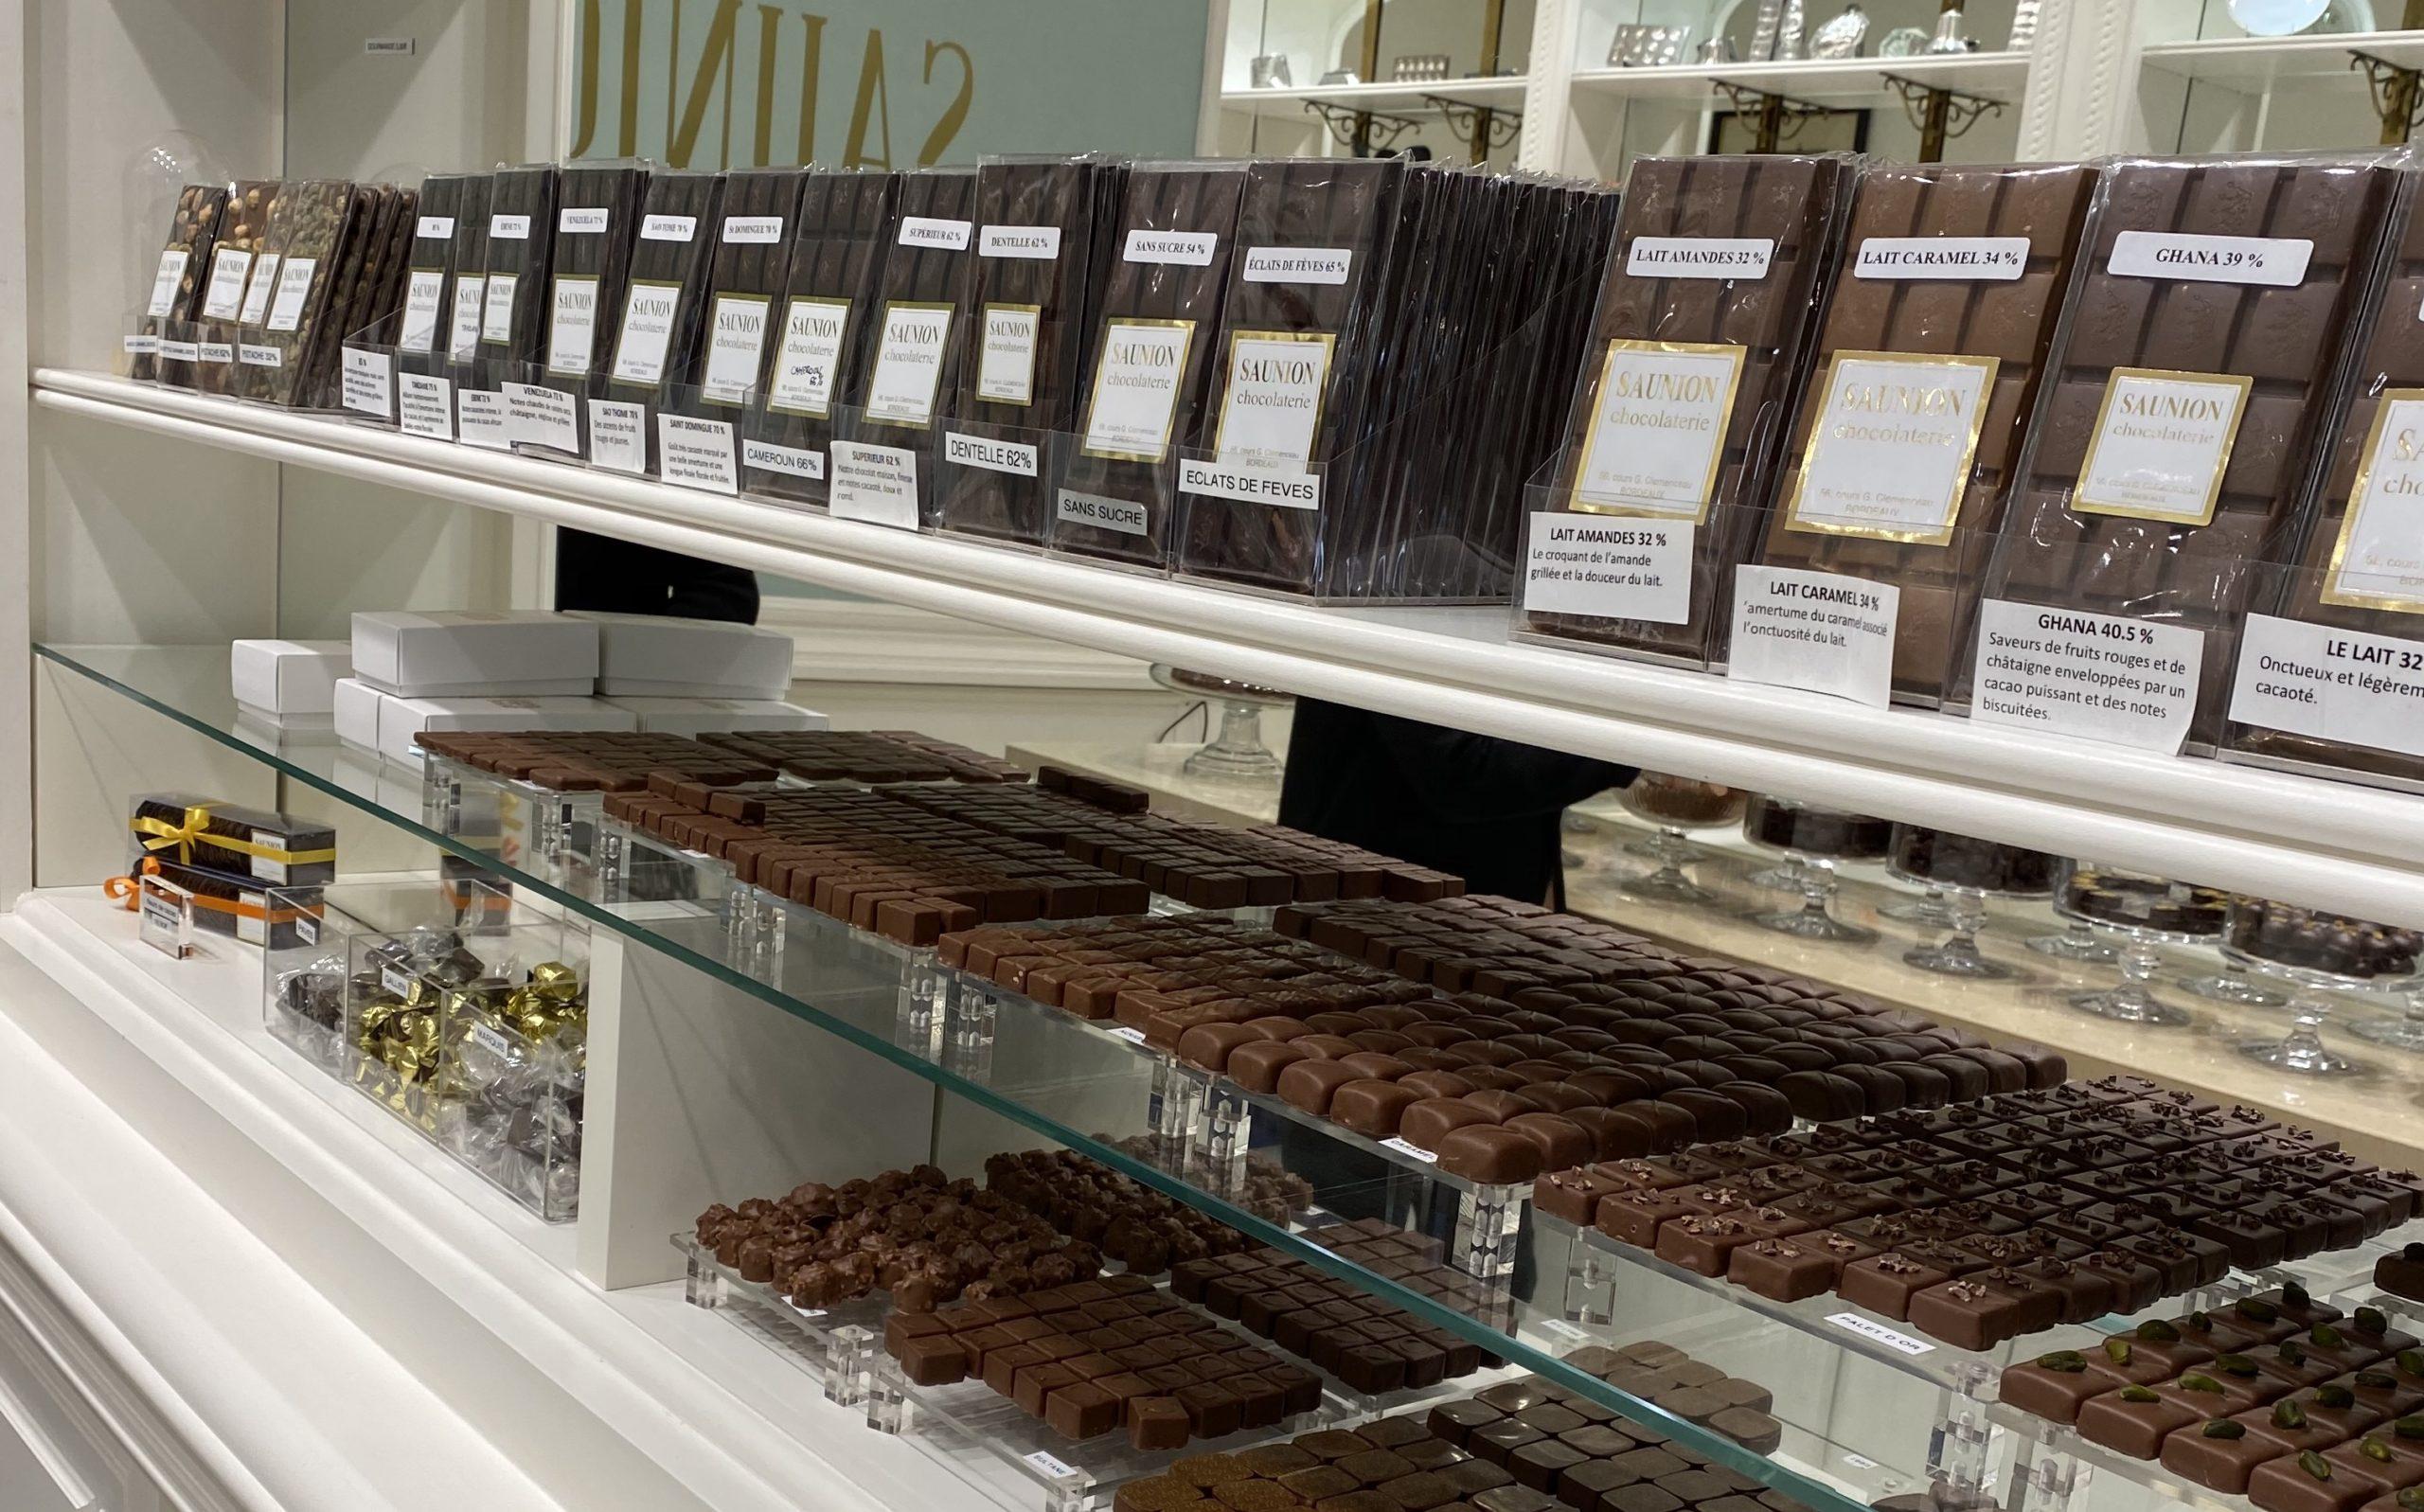 visuel des chocolats en boutique